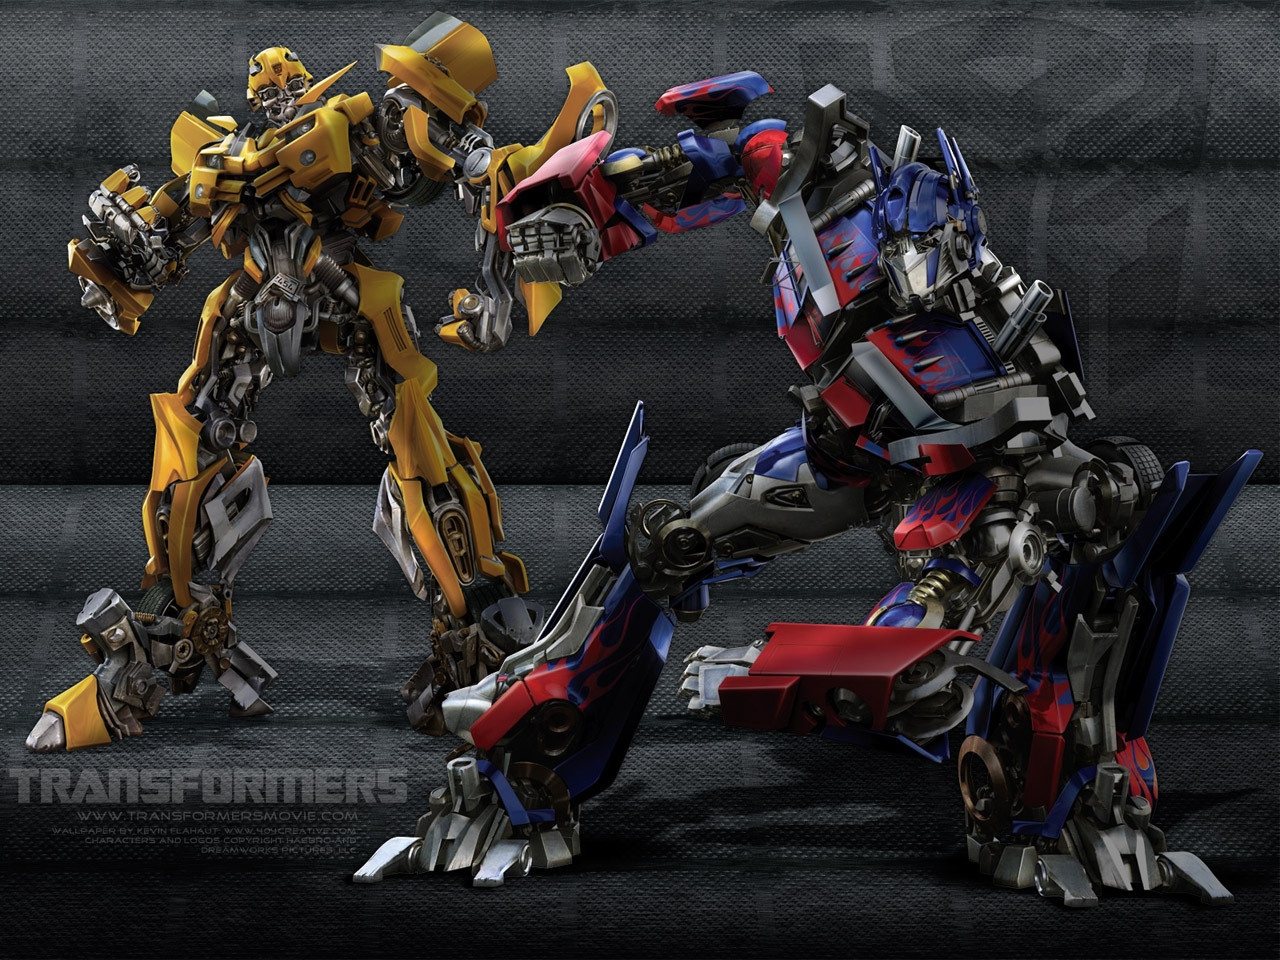 Transformers Wallpaper For Iphone ImageBankbiz 1280x960